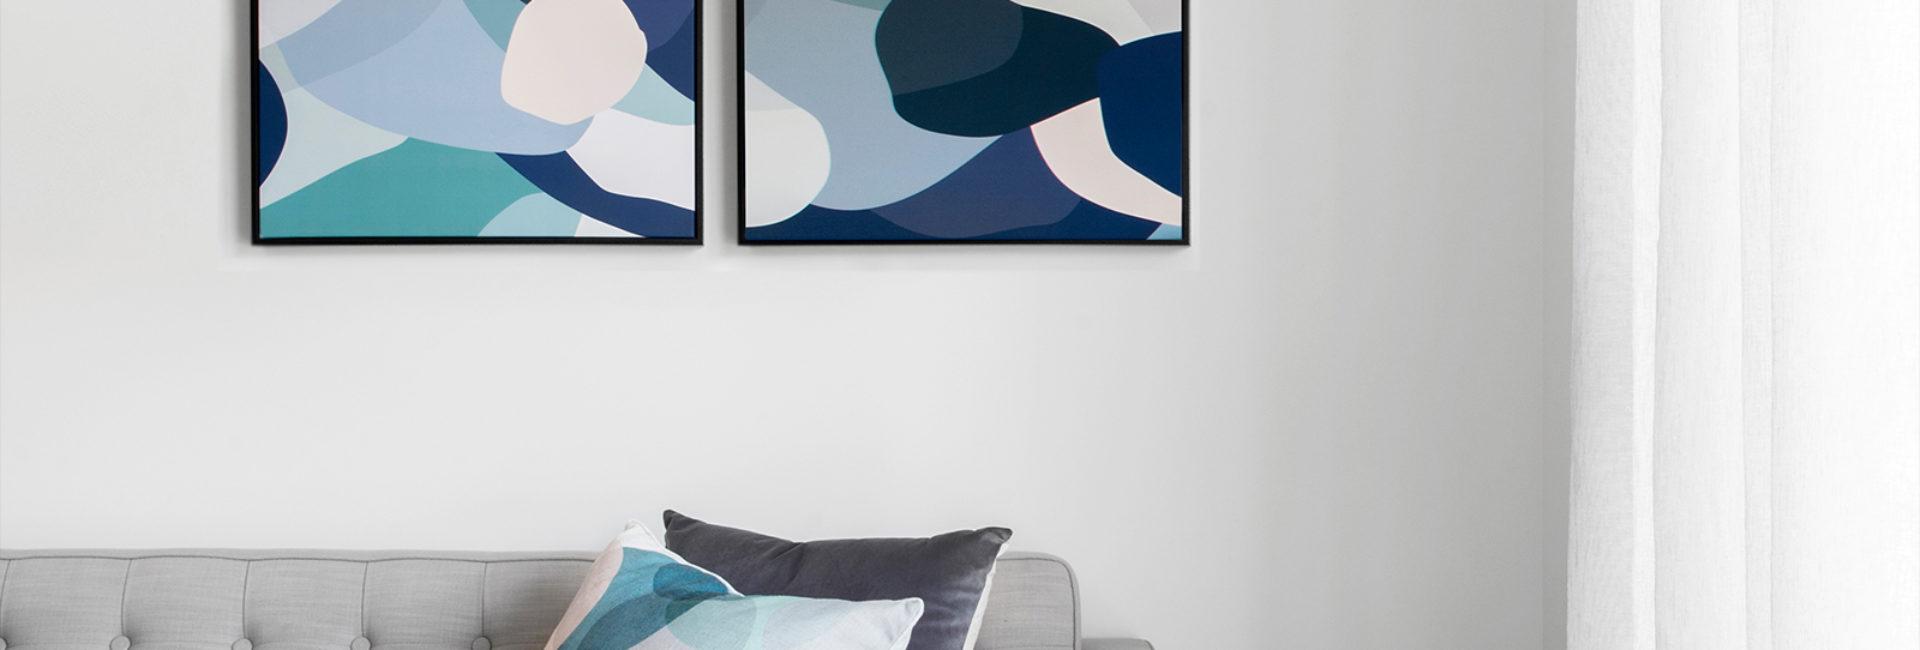 DC Living Brisbane Home Designers